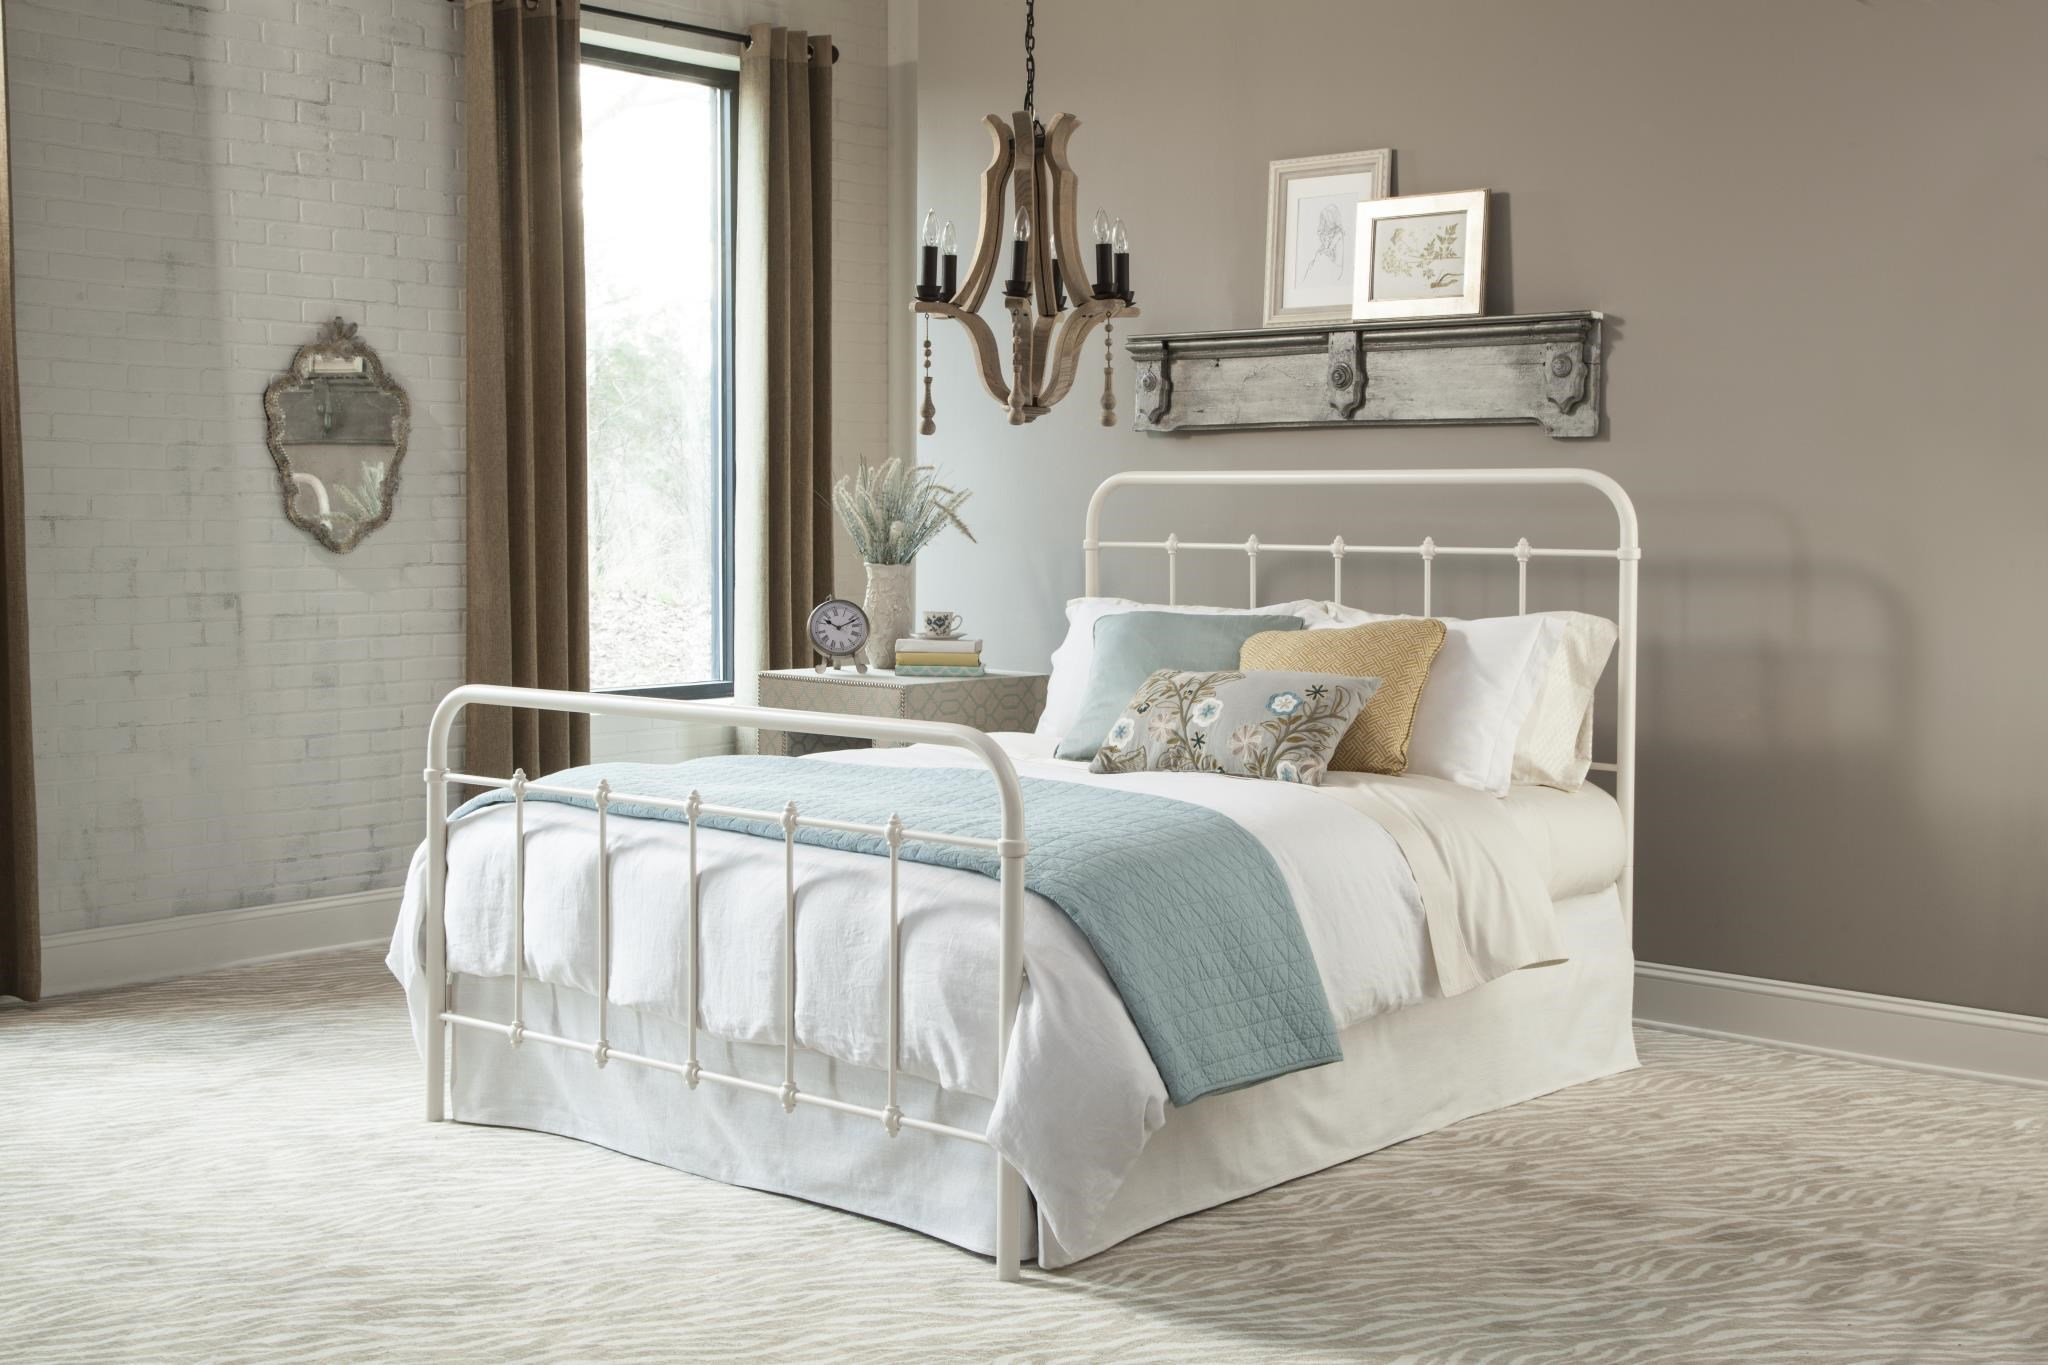 899 Full Size Metal Bed by Kith Furniture at Furniture Fair - North Carolina